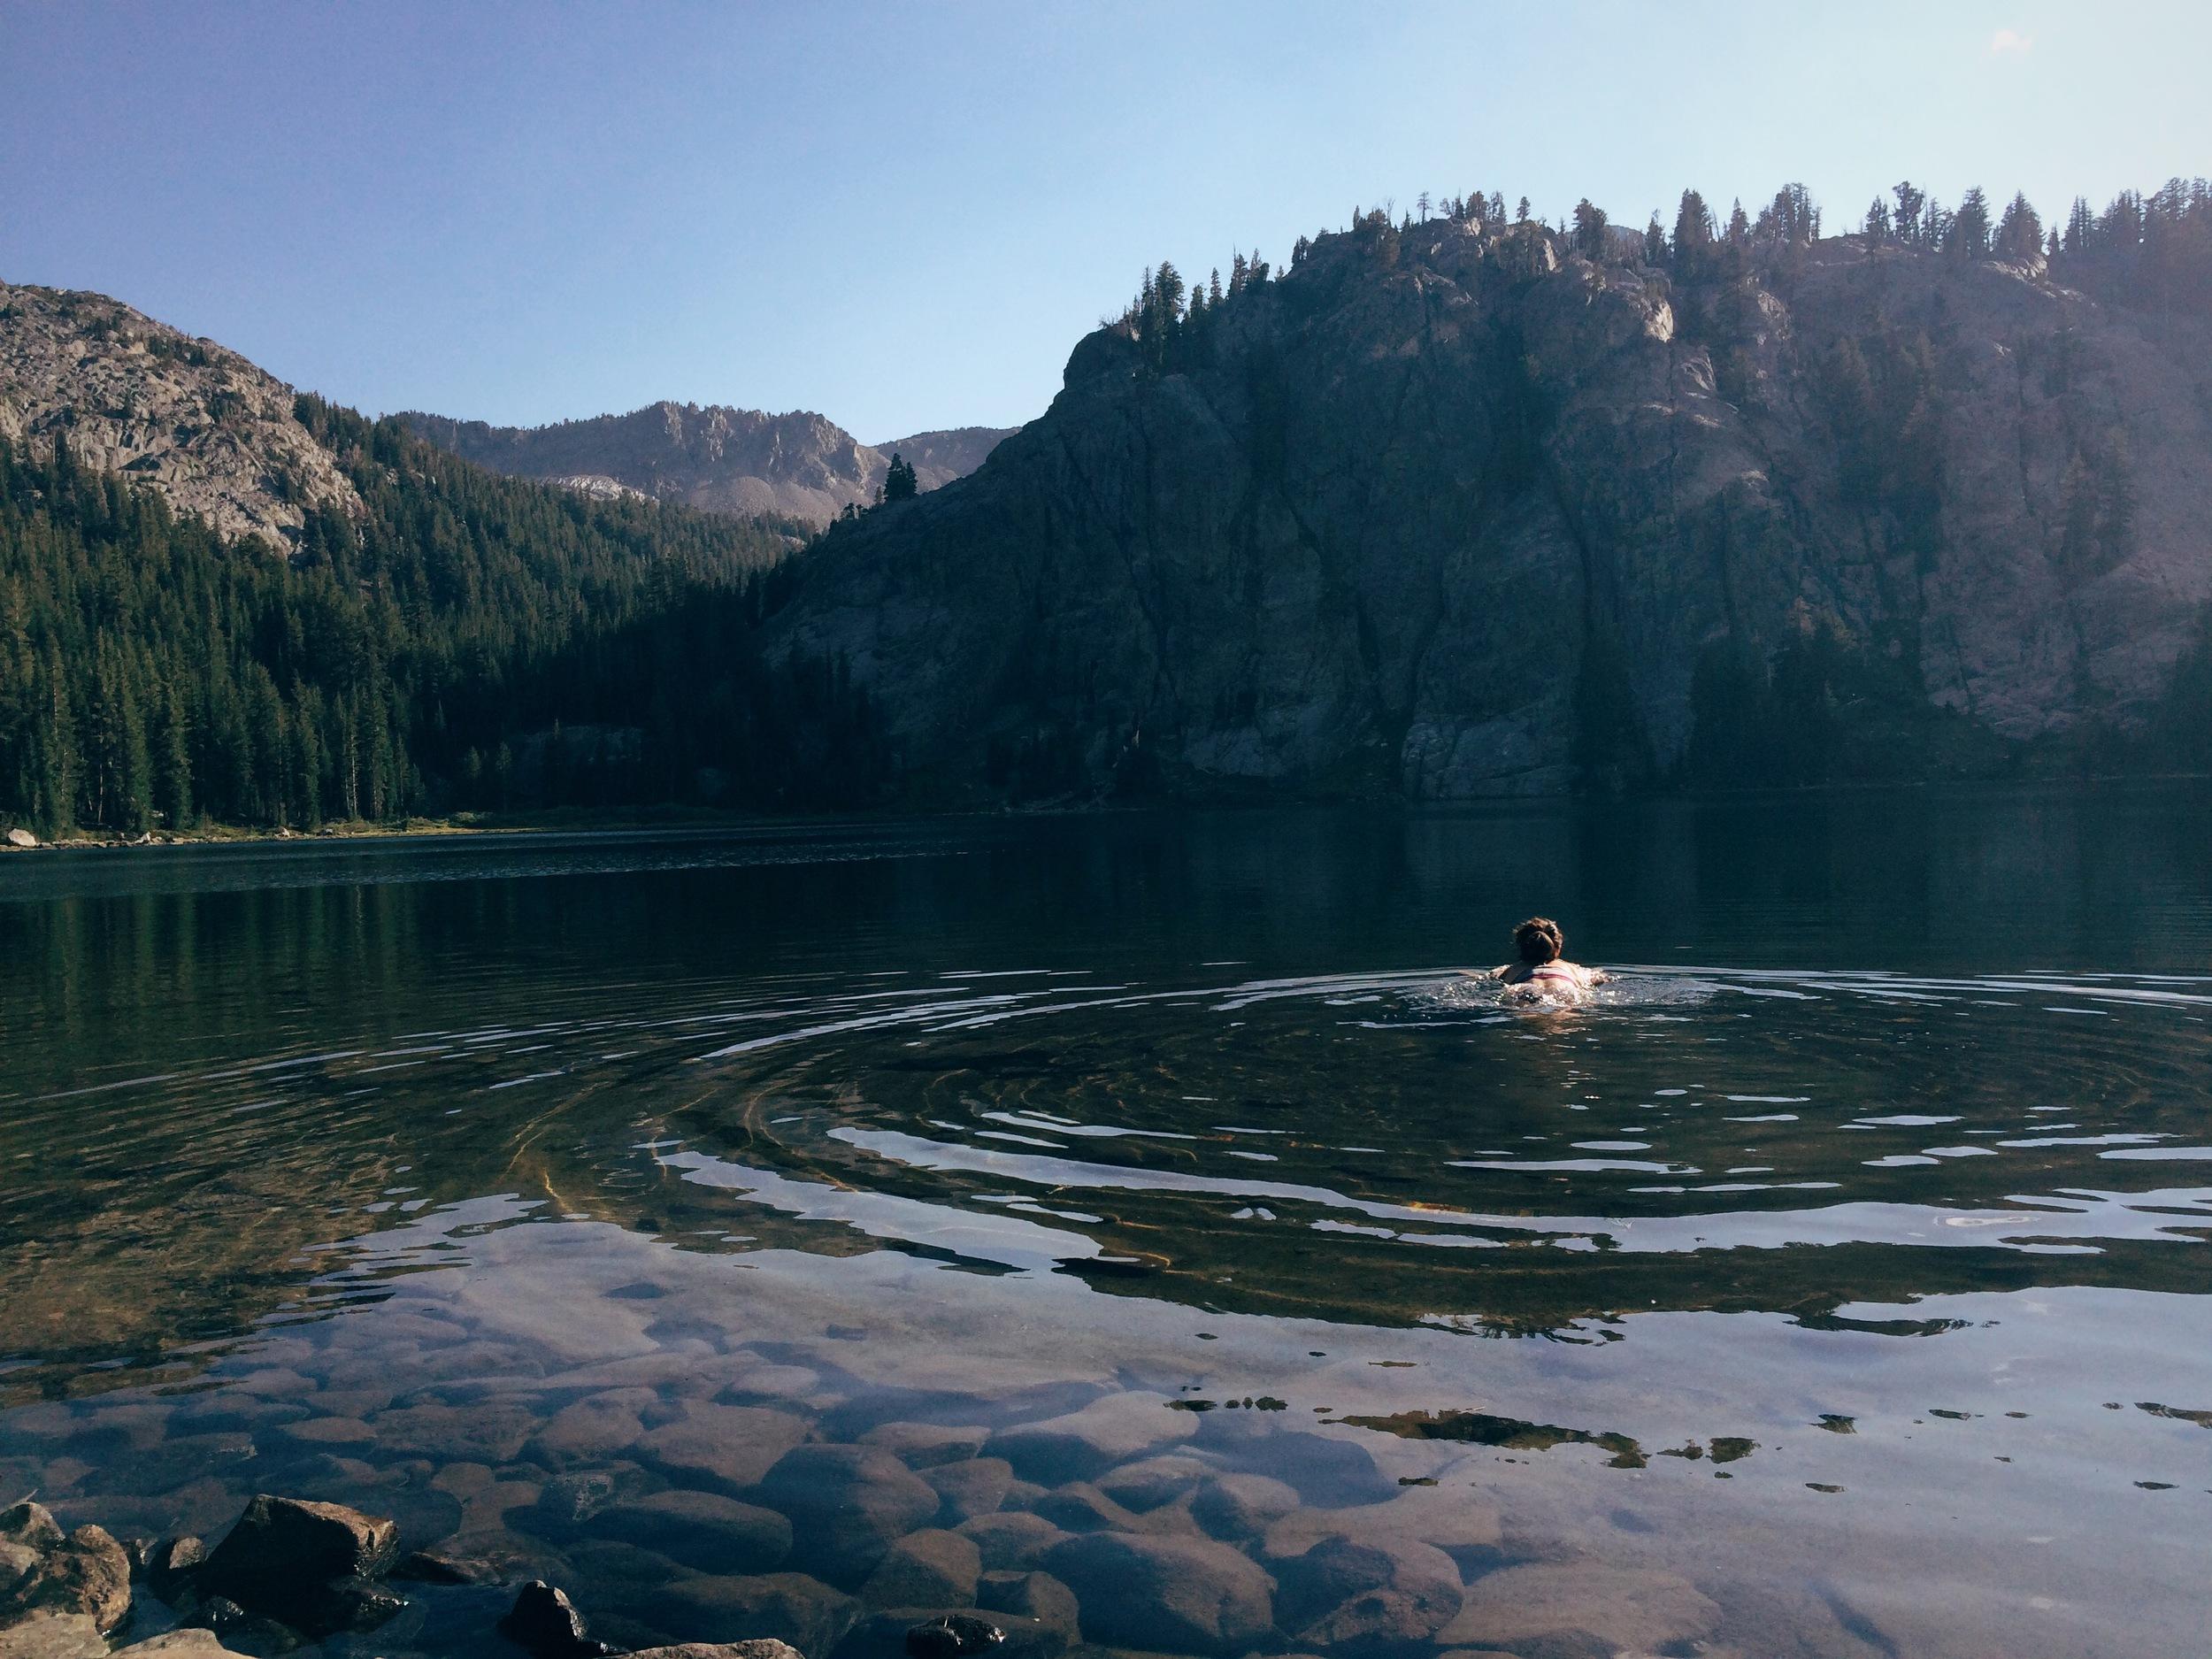 E taking a dip at Rosalie Lake.